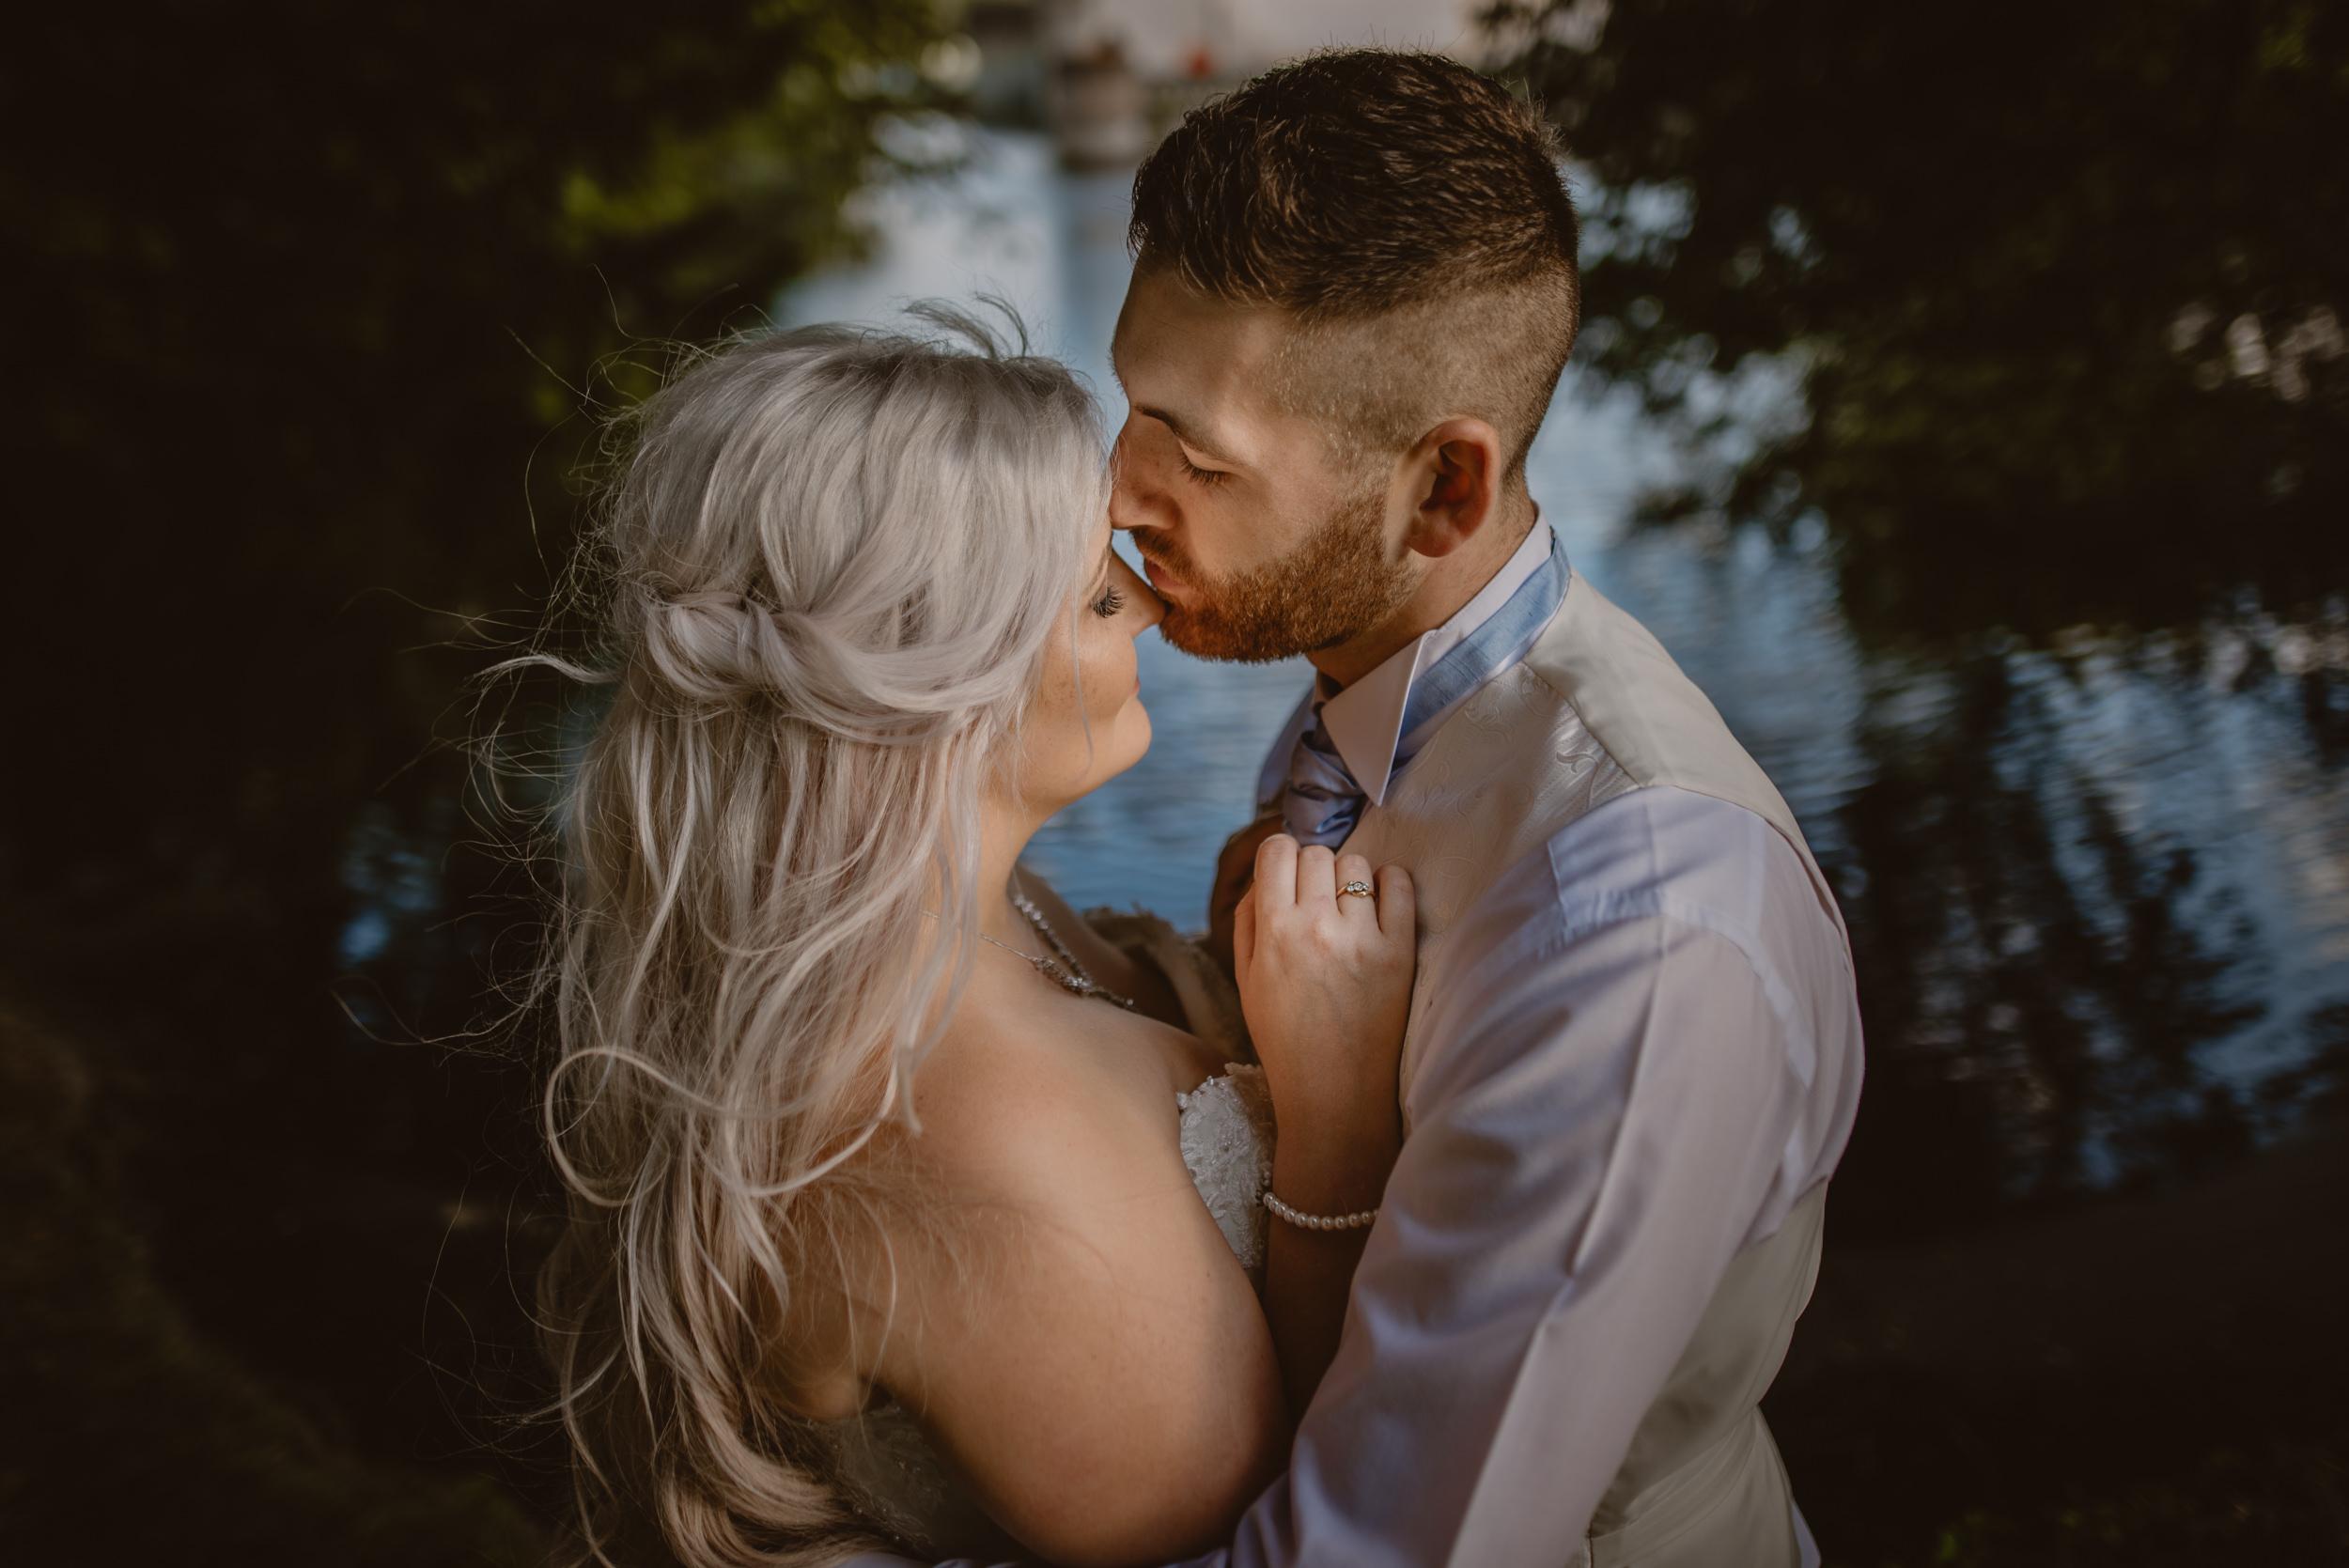 Rachel-and-James-Wedding-Horsley-Towers-State-Manu-Mendoza-Wedding-Photography-500.jpg